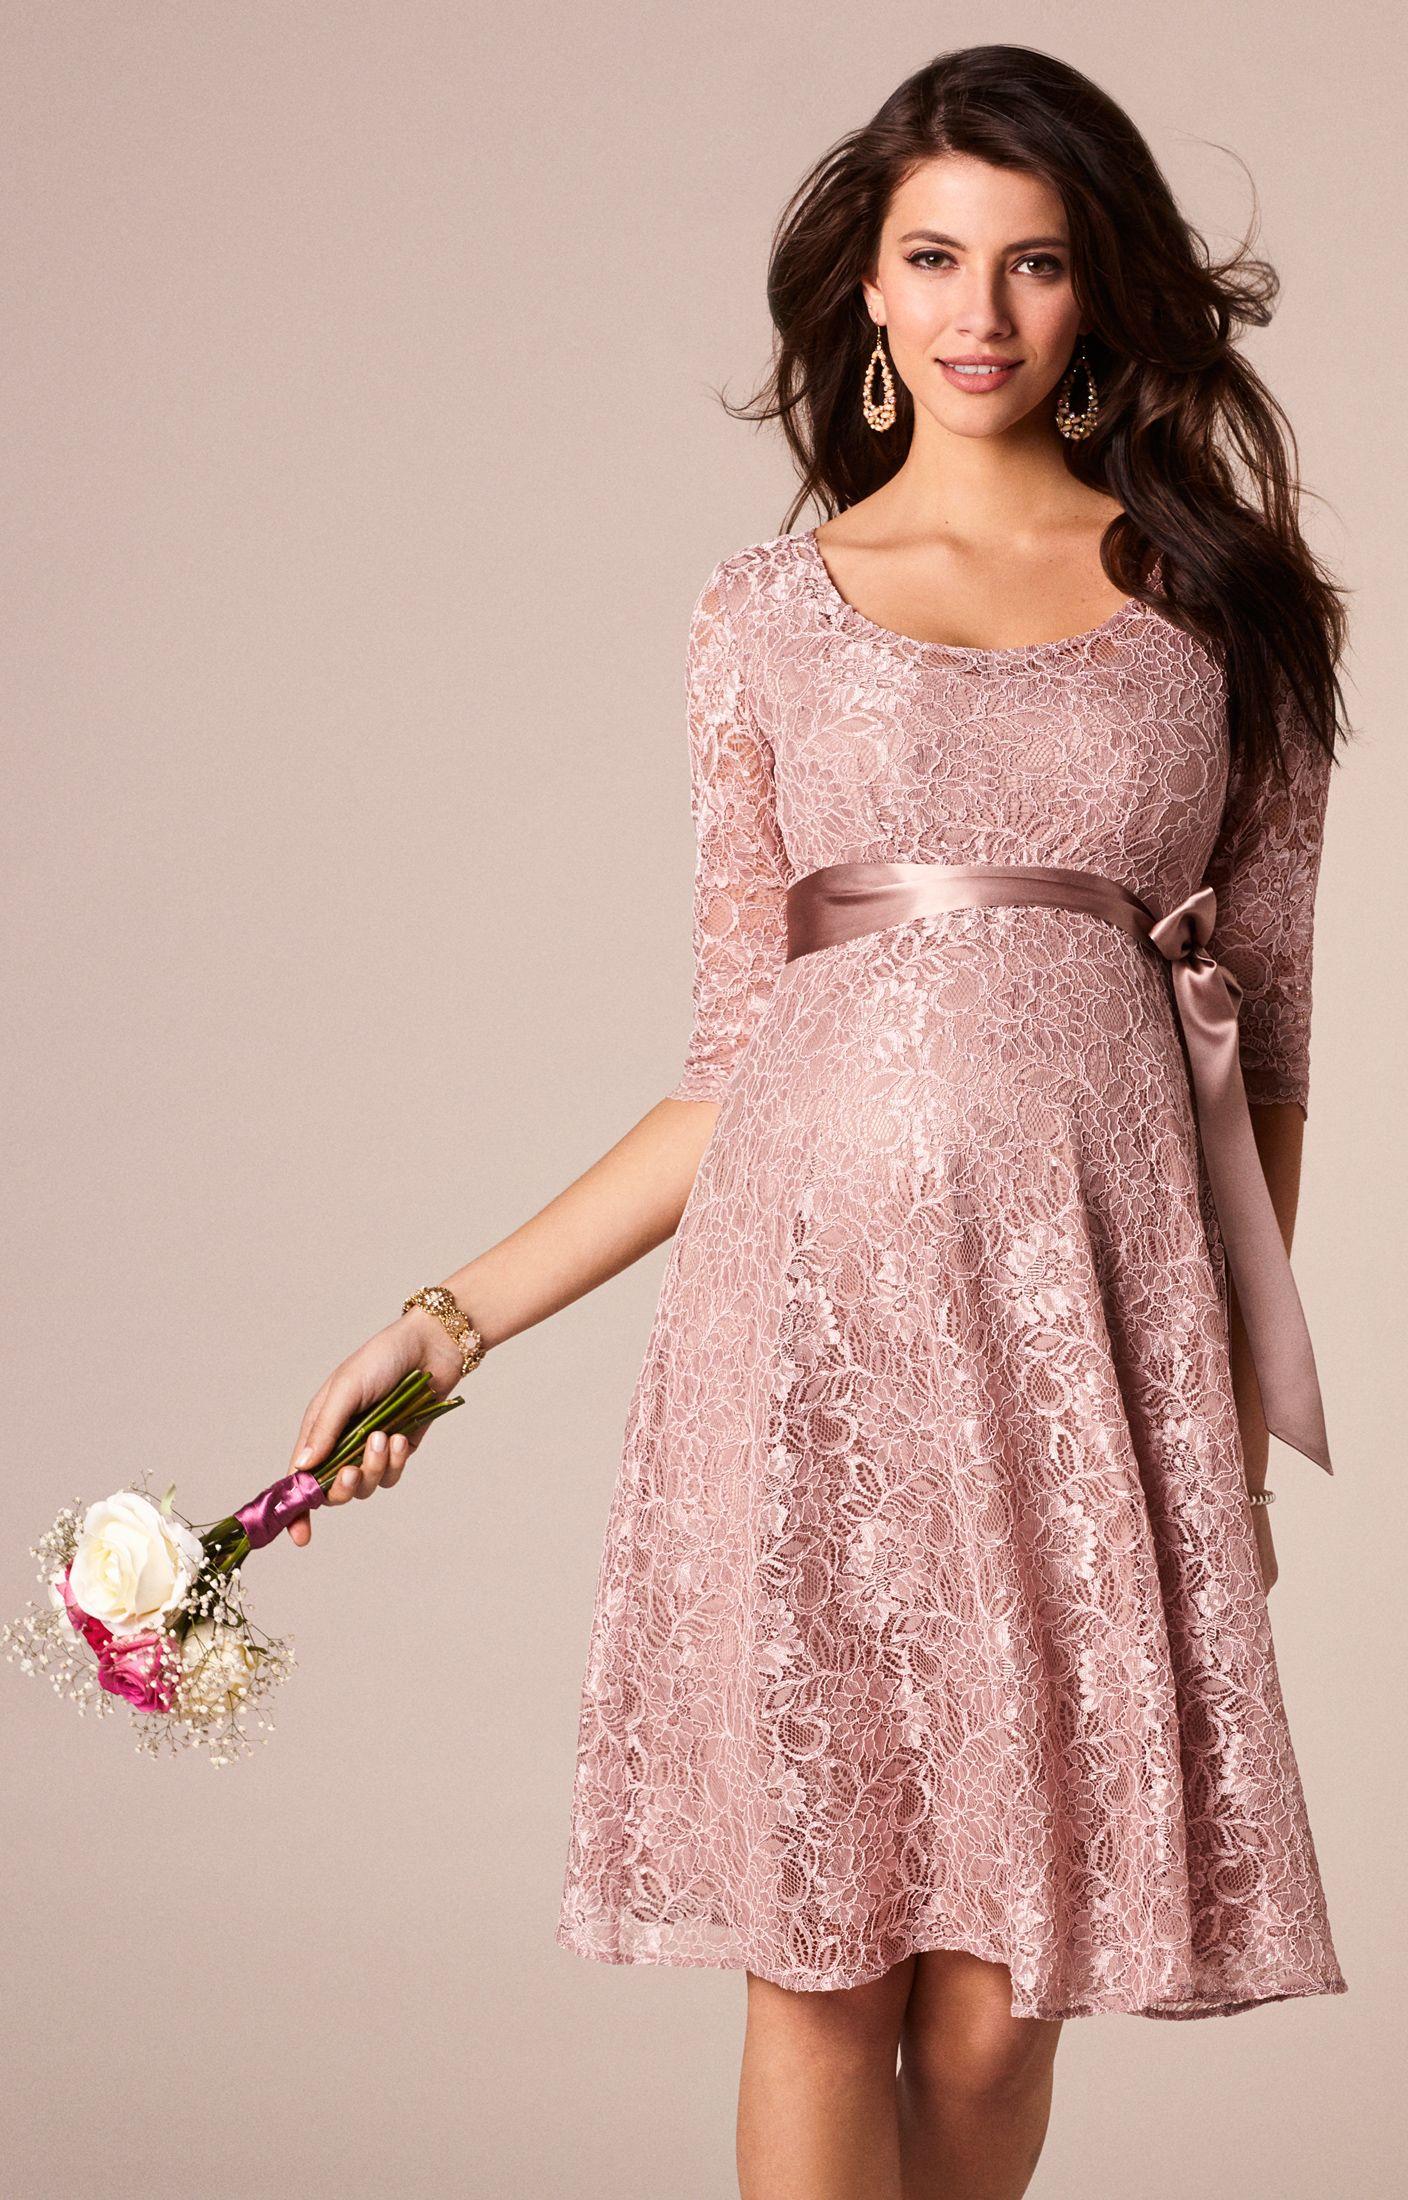 Freya dress short tiffany rose maternity dresses and tiffany freya dress short ombrellifo Choice Image